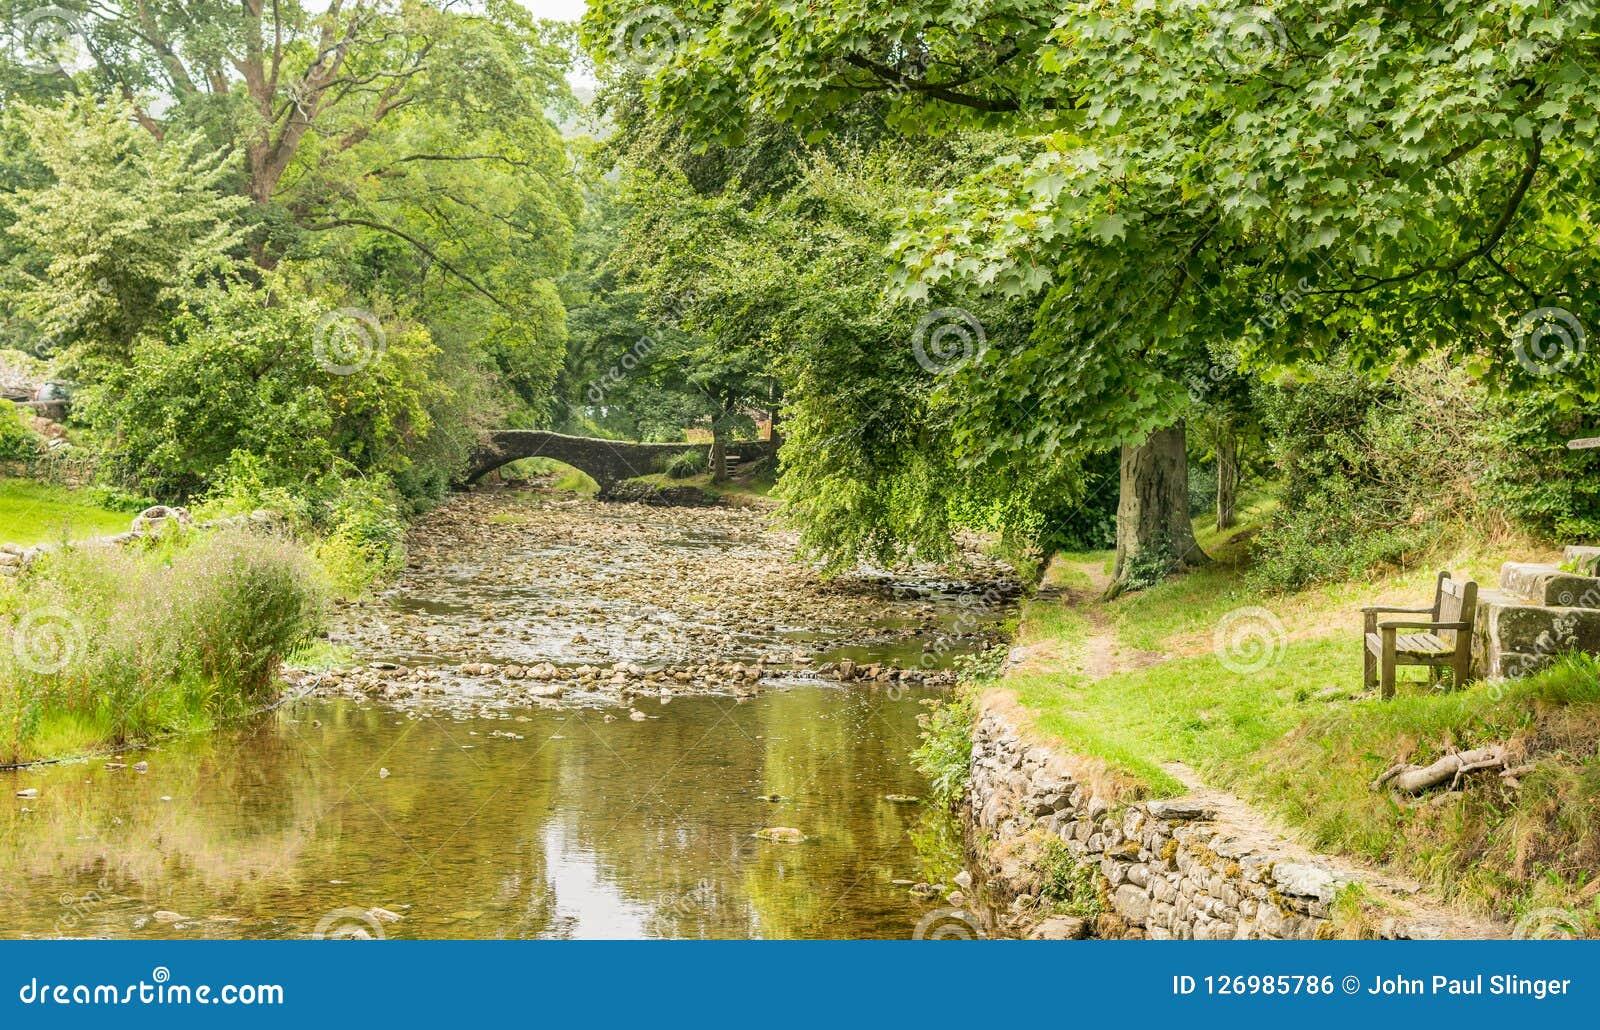 A stone humpback bridge over a river